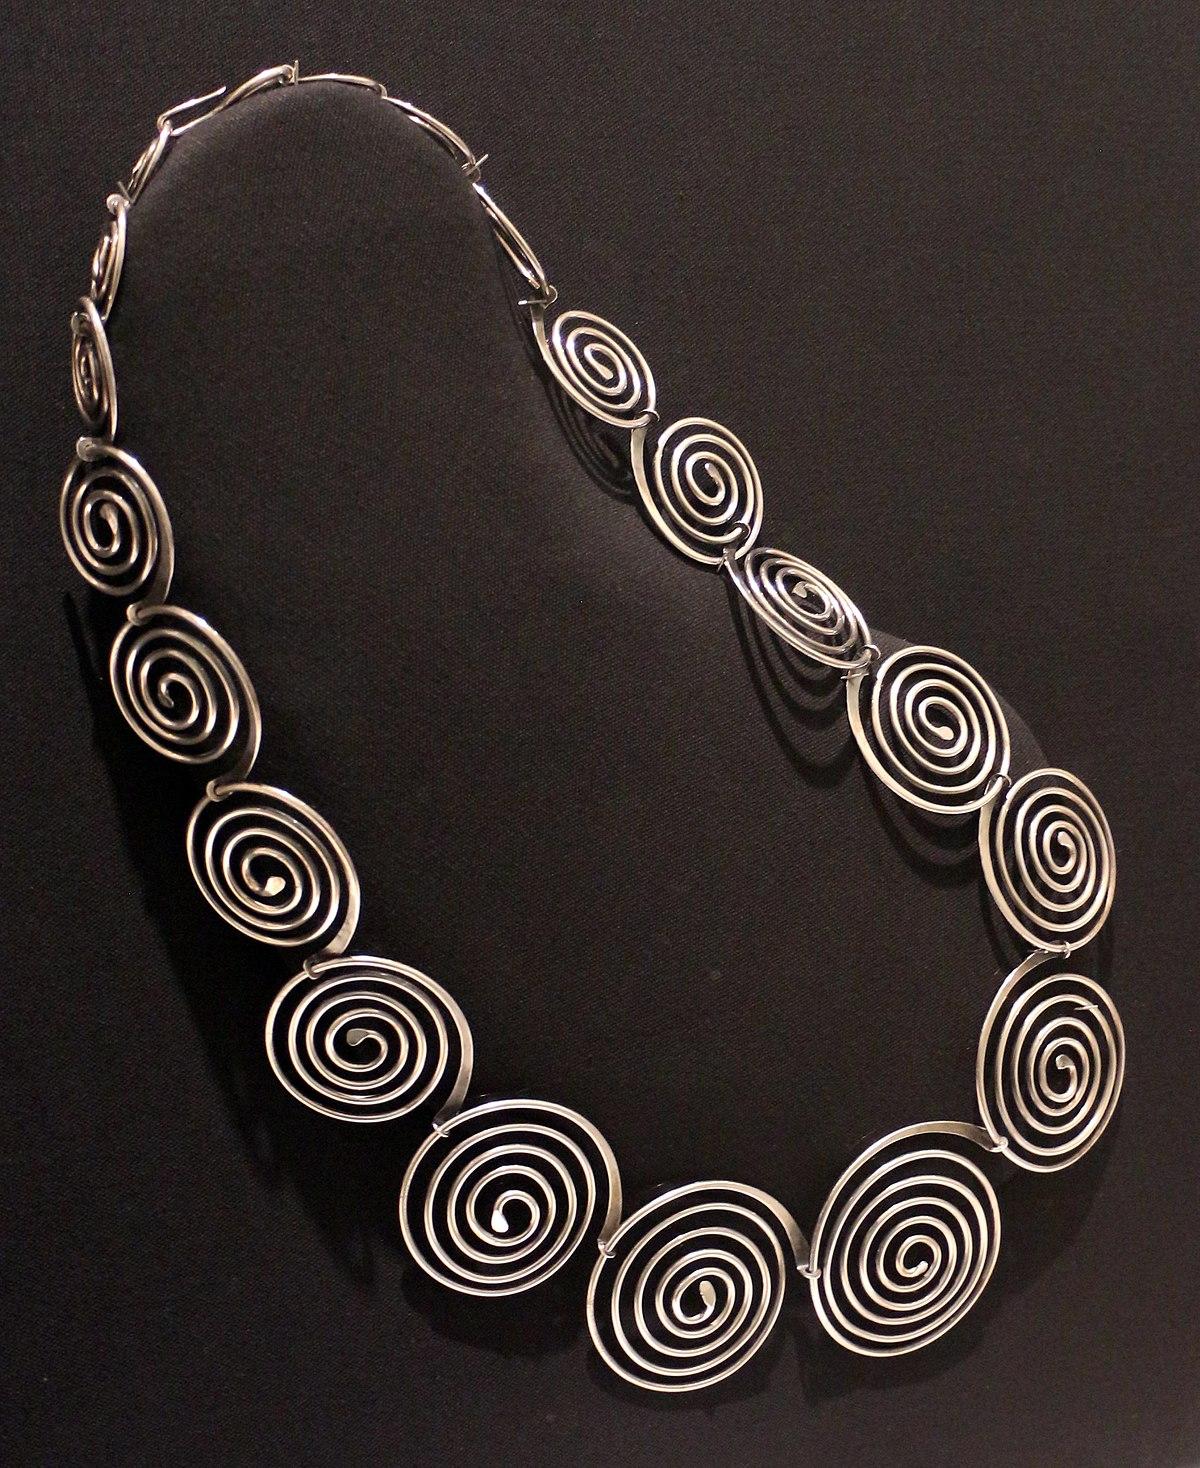 Art Smith Jeweler Wikipedia